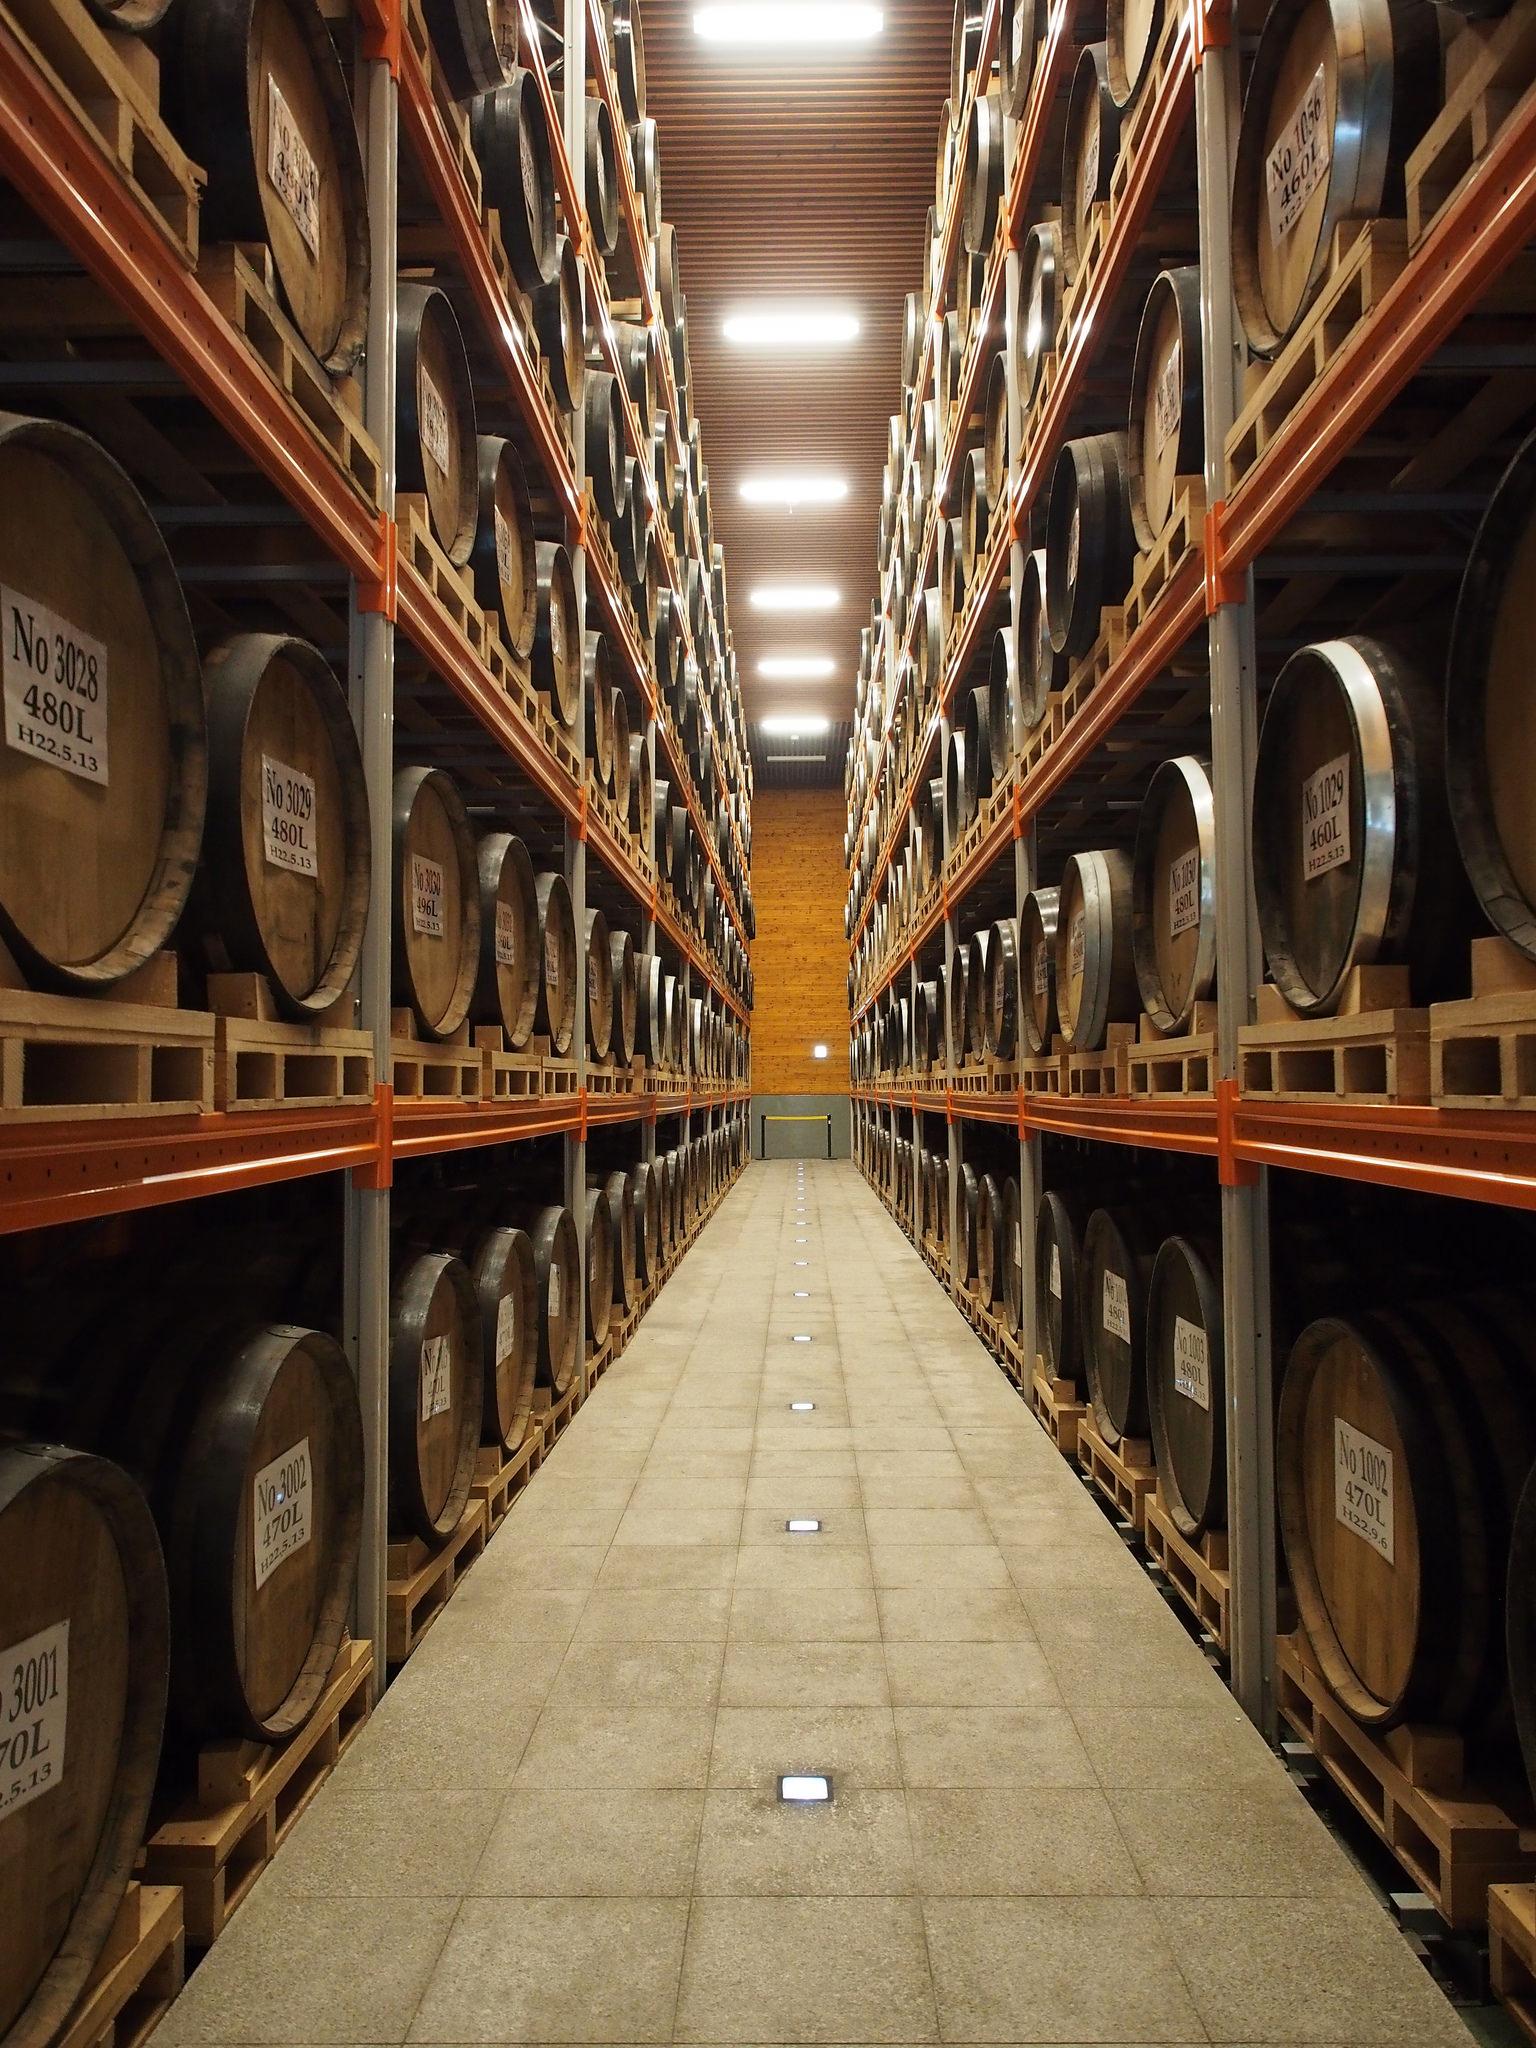 Shochu aged in oak barrels result in a different flavor profile. ©TOKI